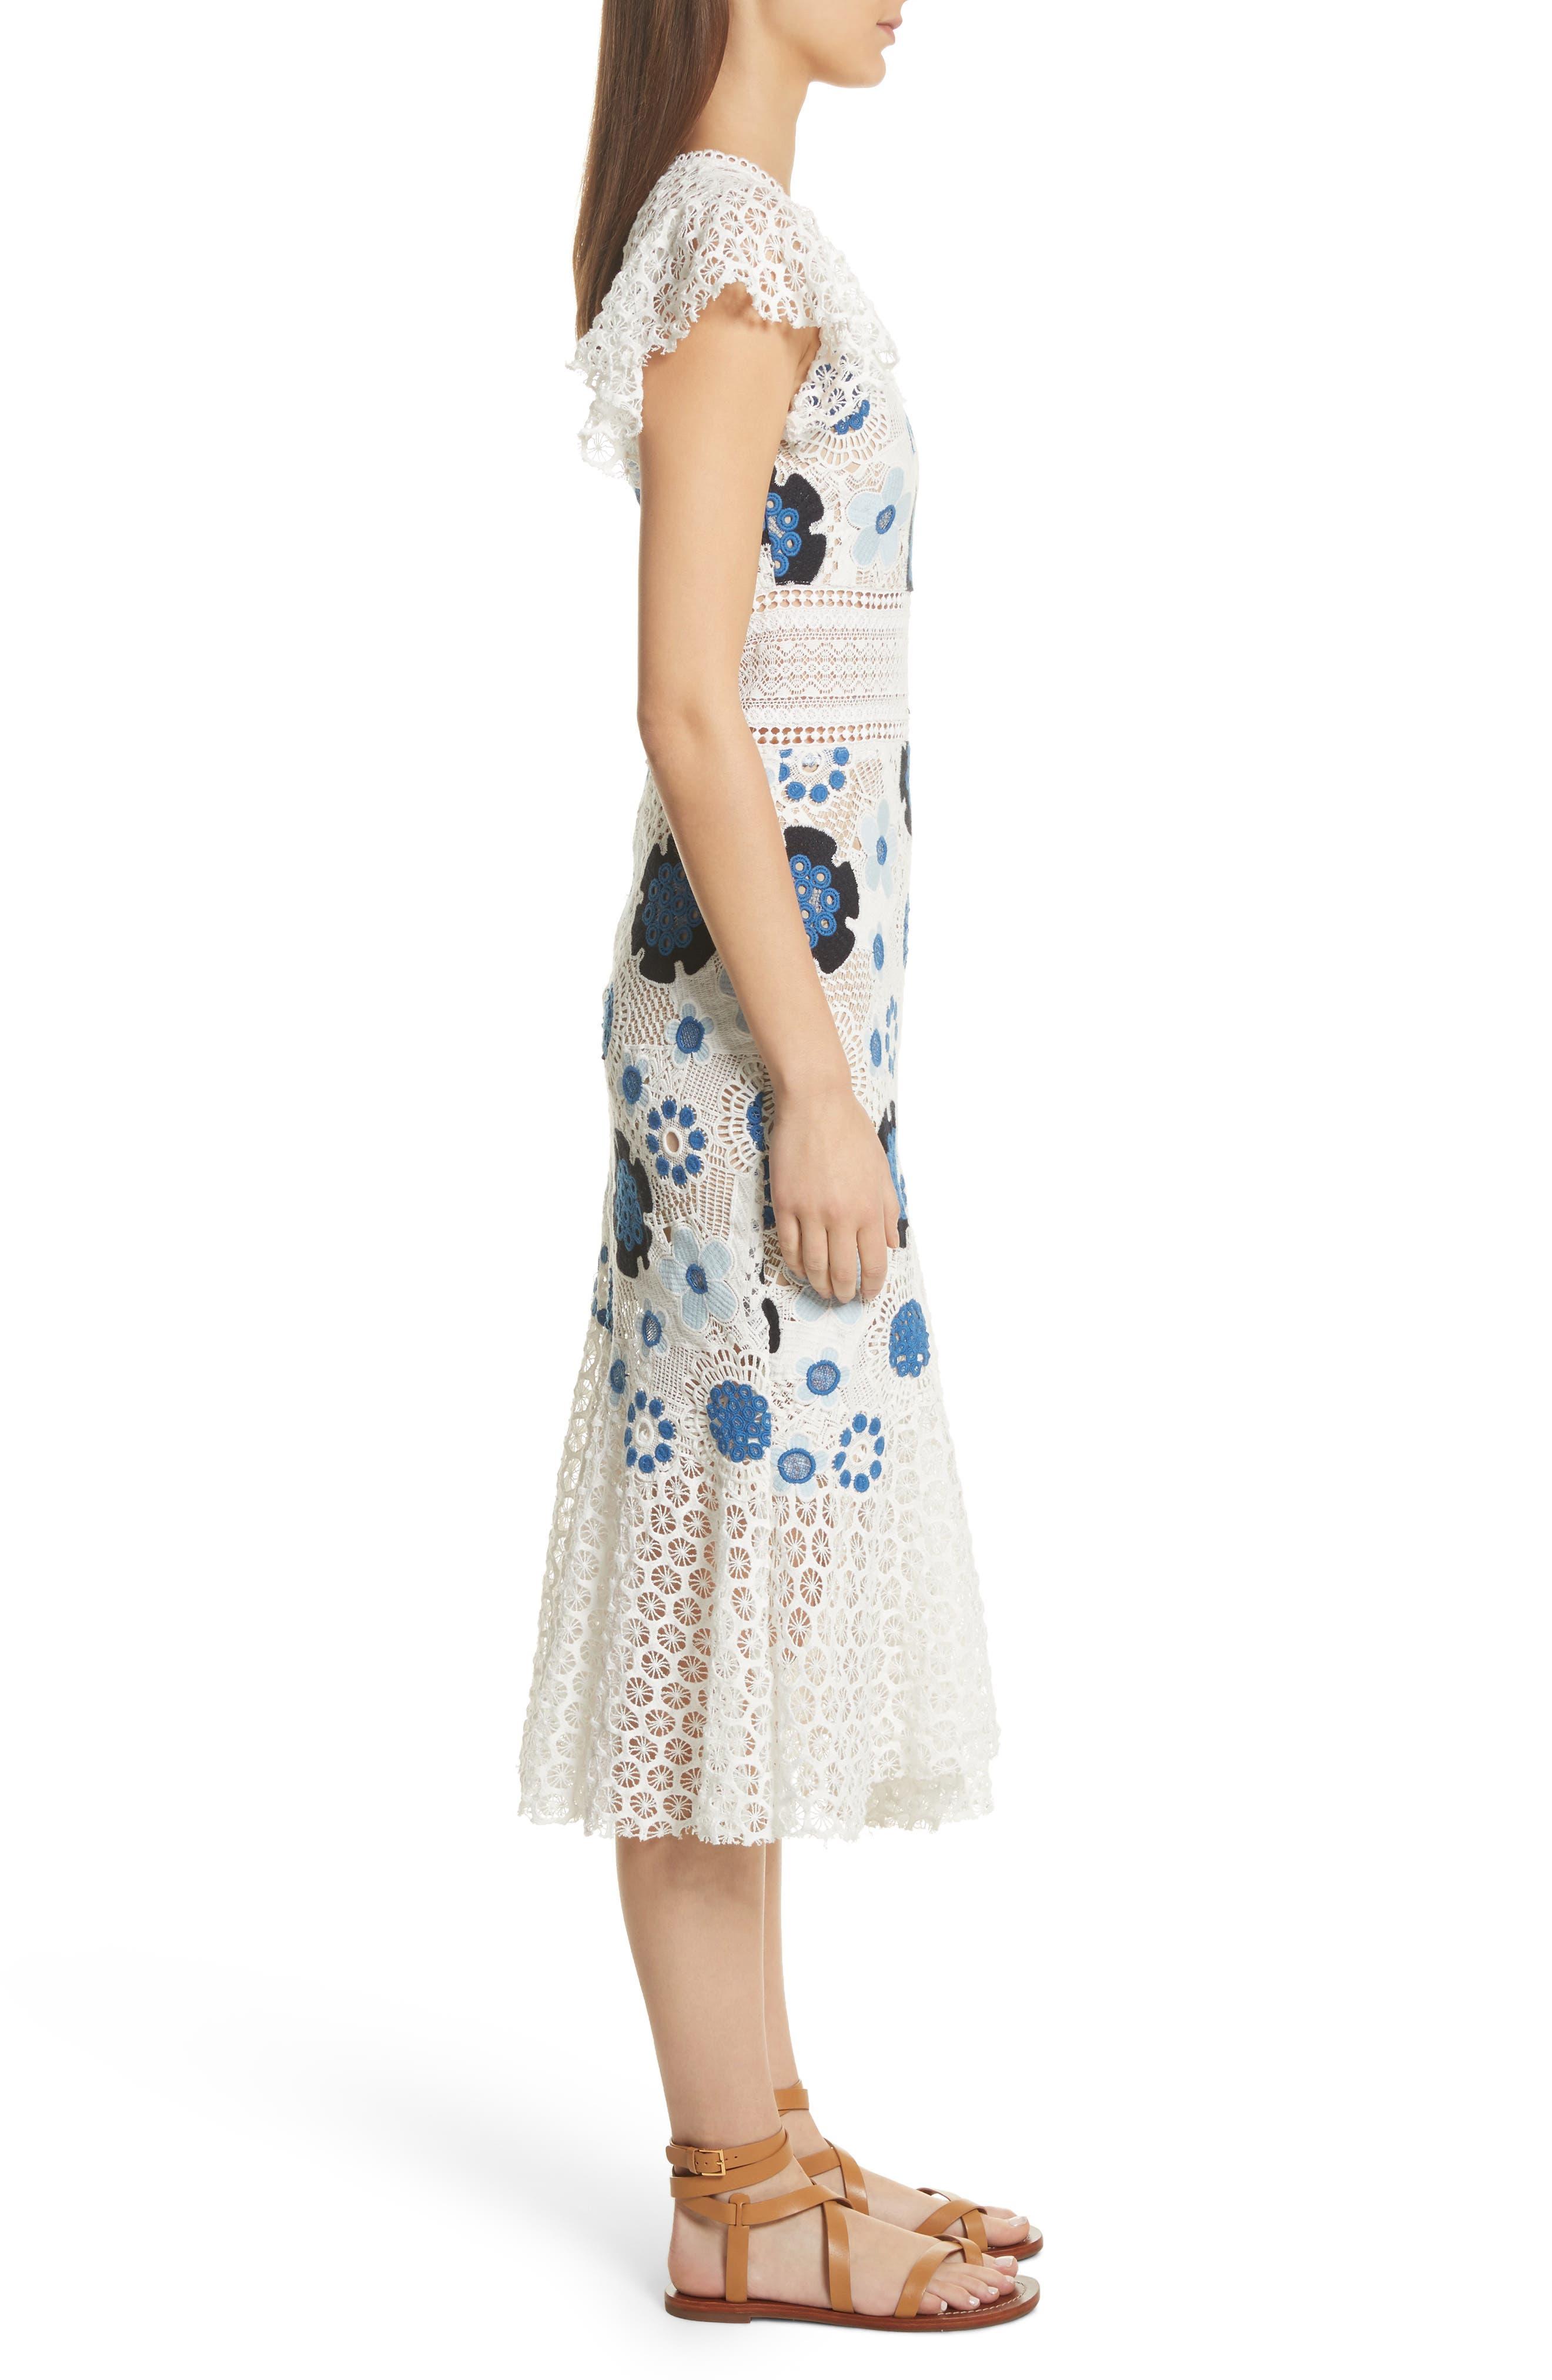 Figgy Crochet Dress,                             Alternate thumbnail 3, color,                             Cream/ Blue Multi